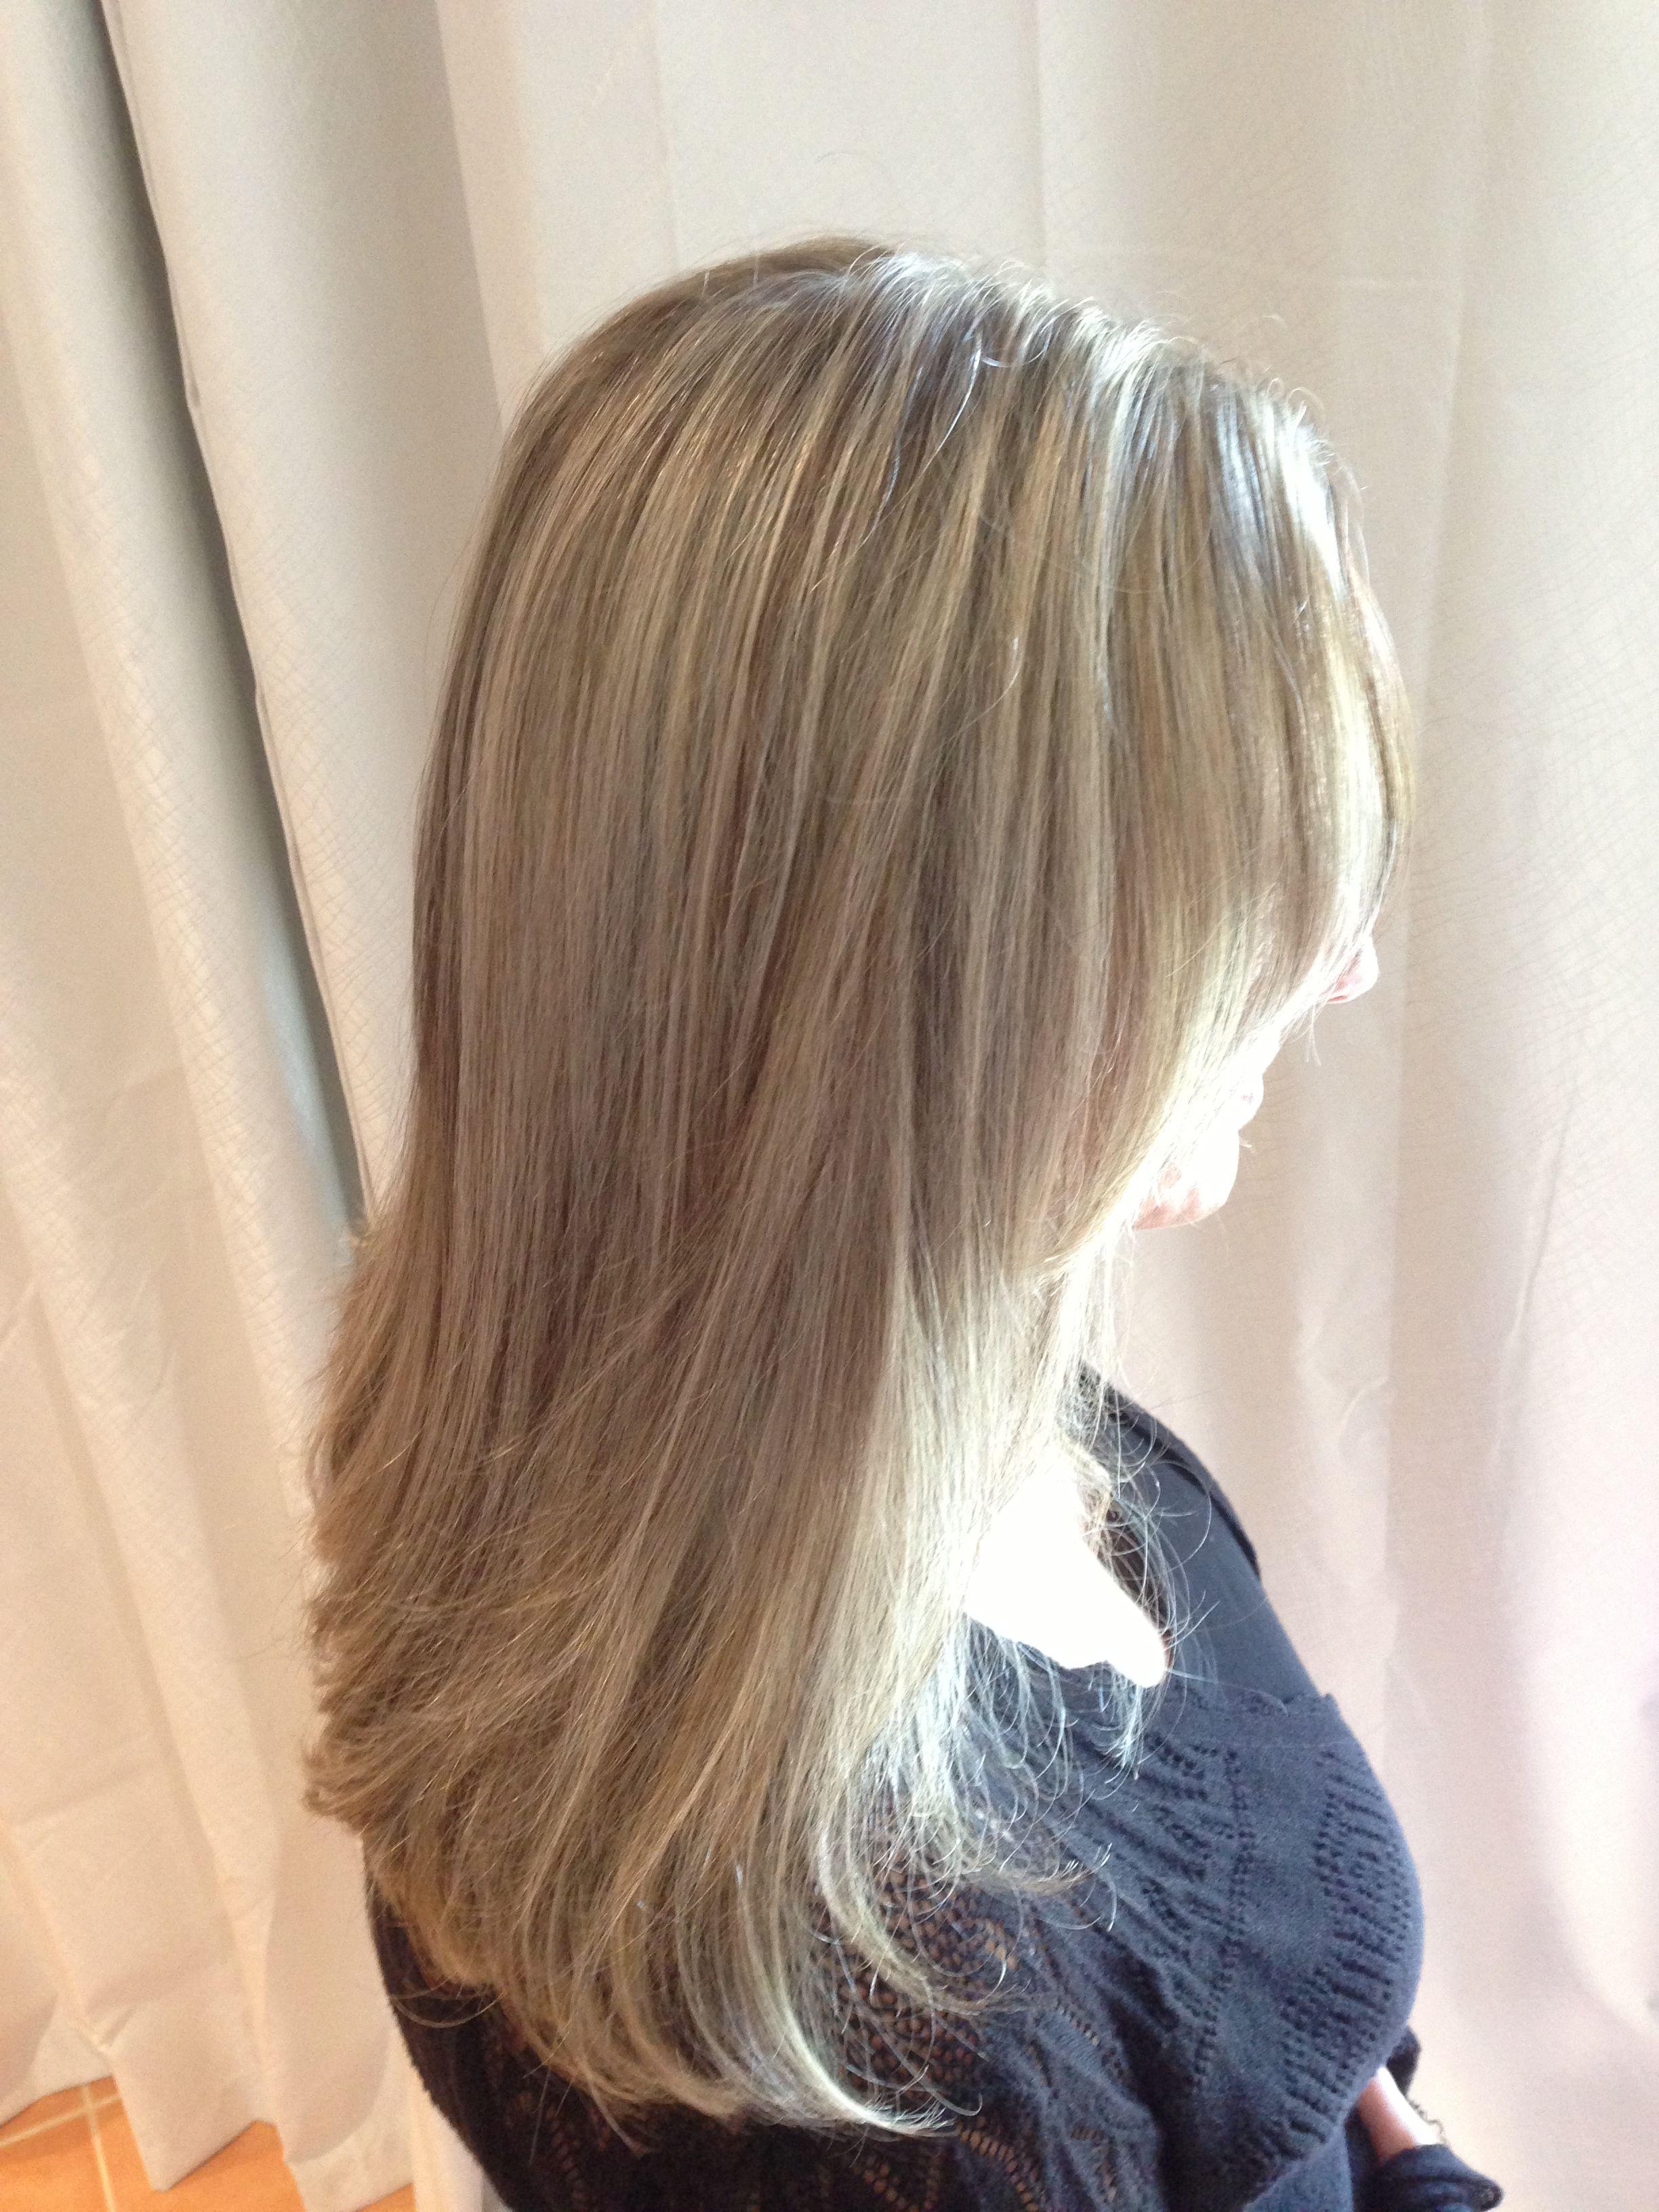 Blonde Foils My Style Braided Half Updo Long Hair